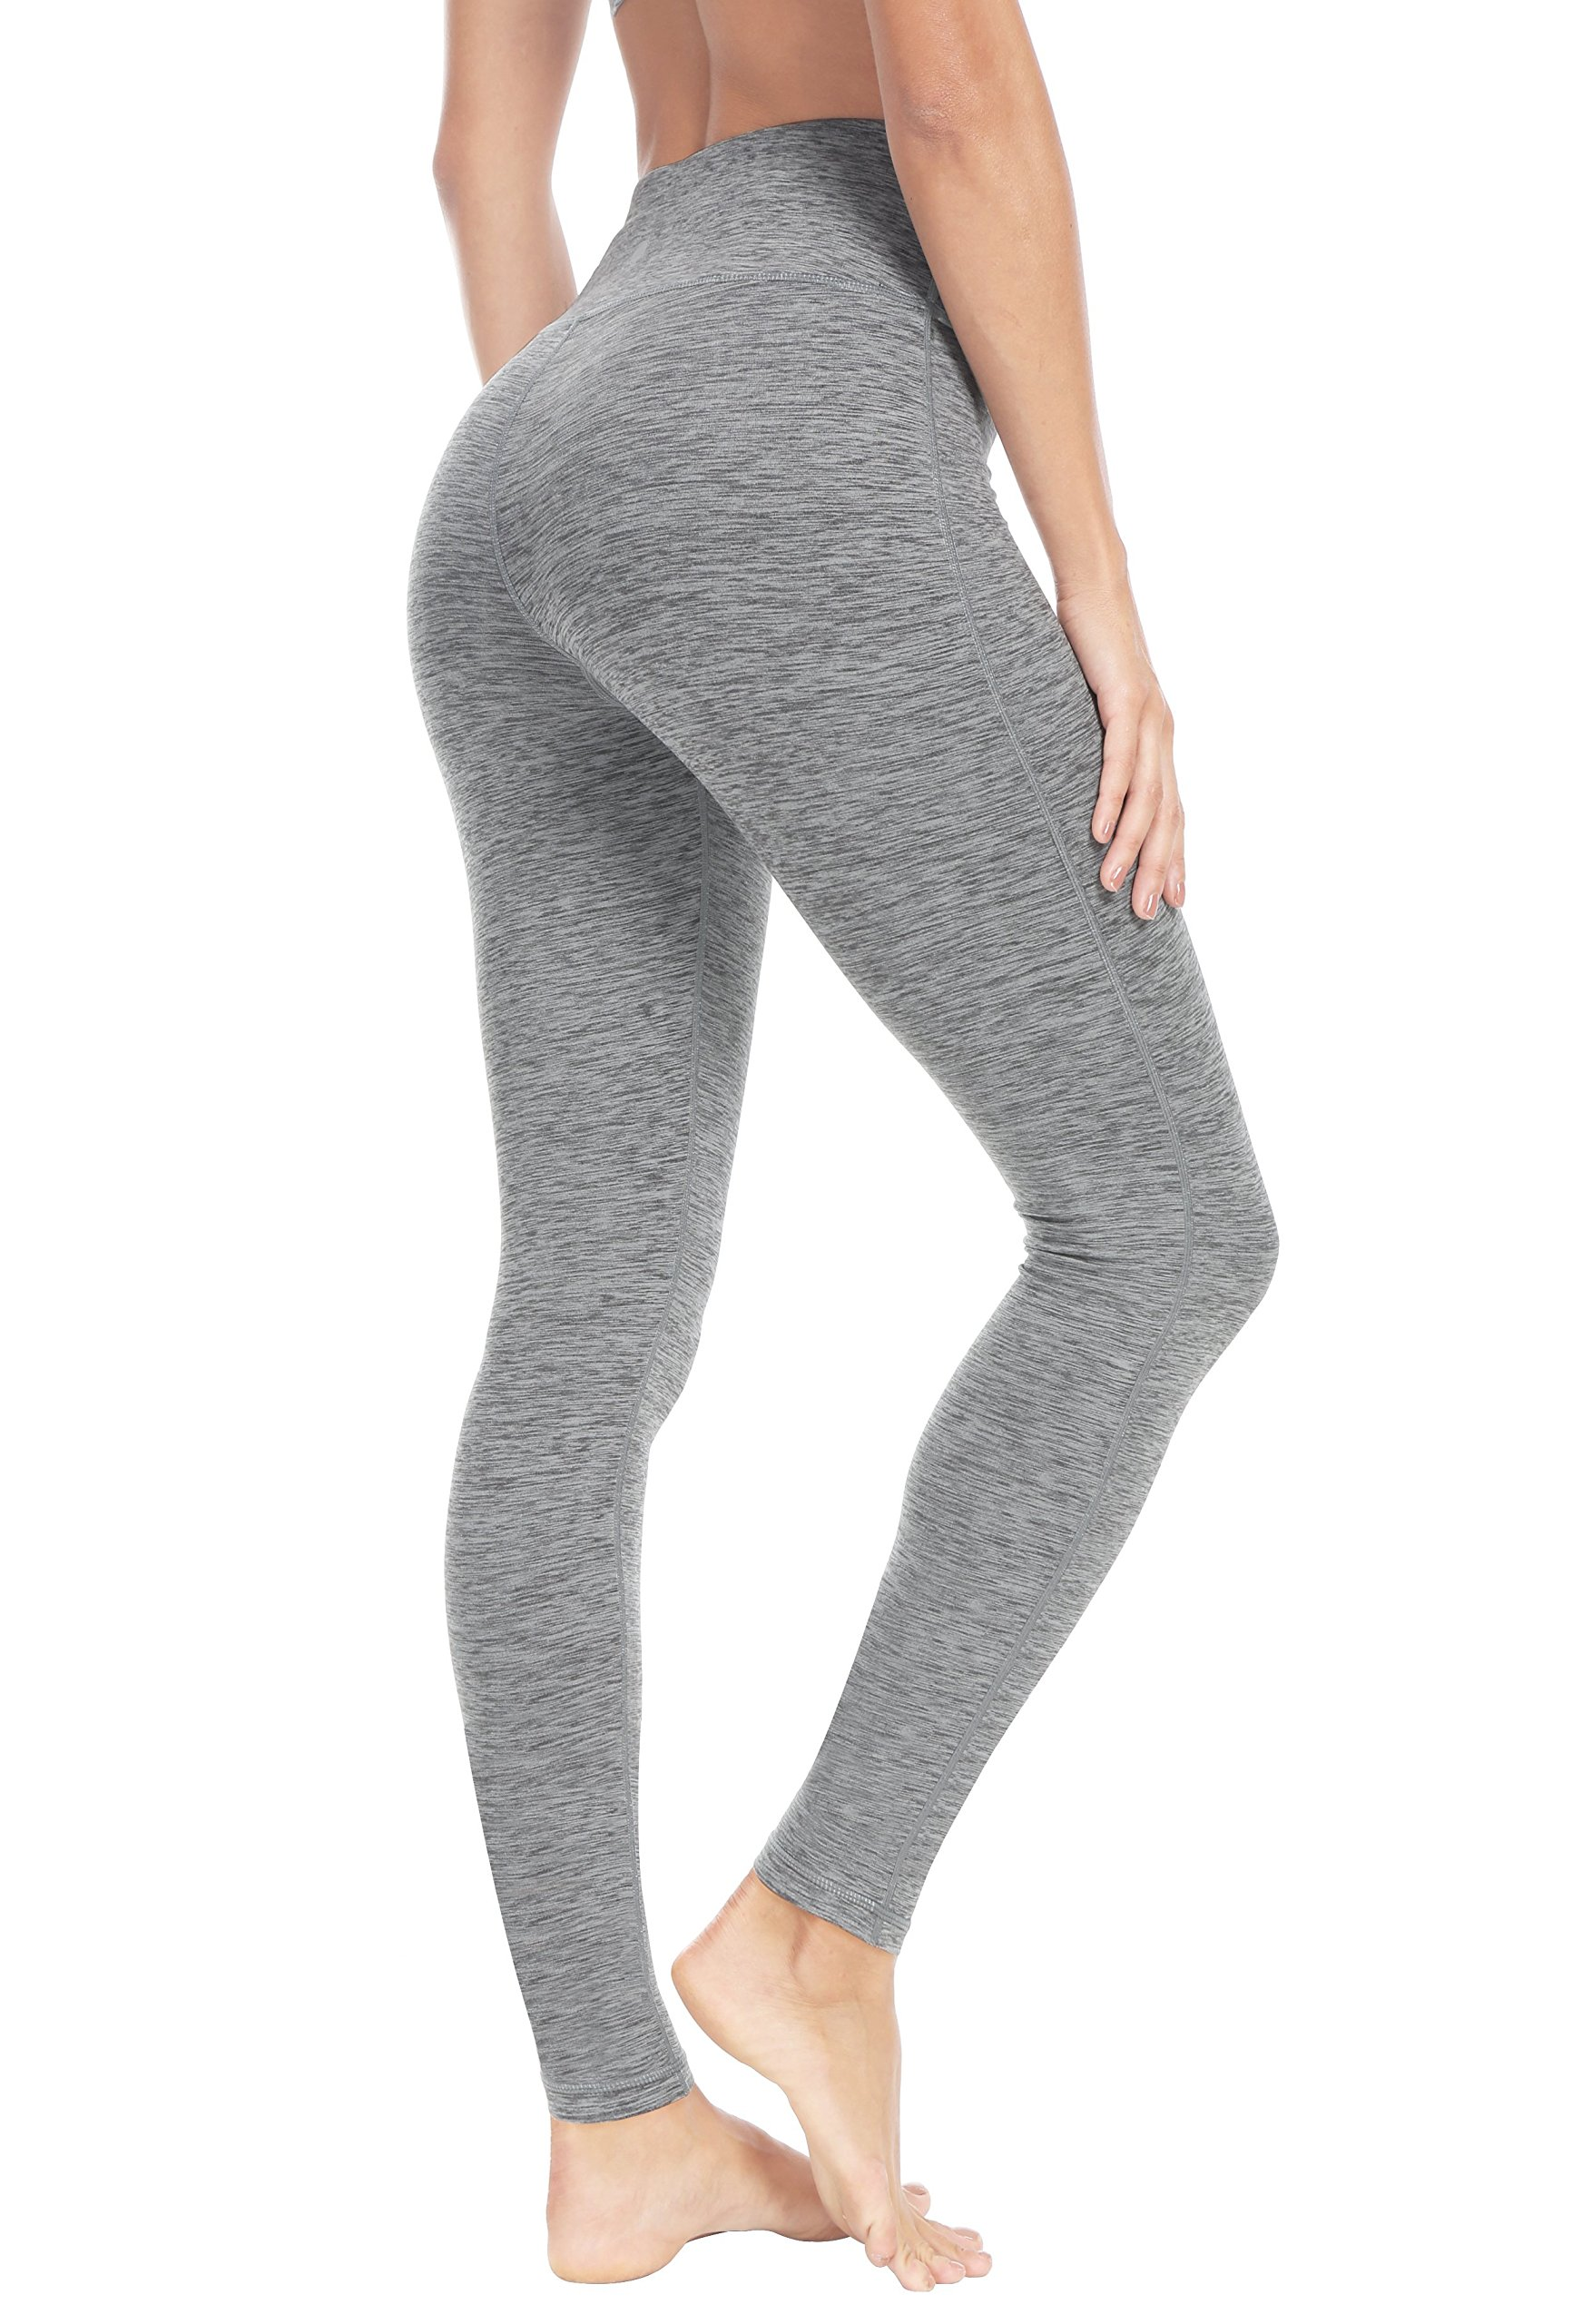 Queenie Ke Women High Waist Hidden Pockets Sport Legging Yoga Pants Running Tights Size M Color Space Dye Grey2